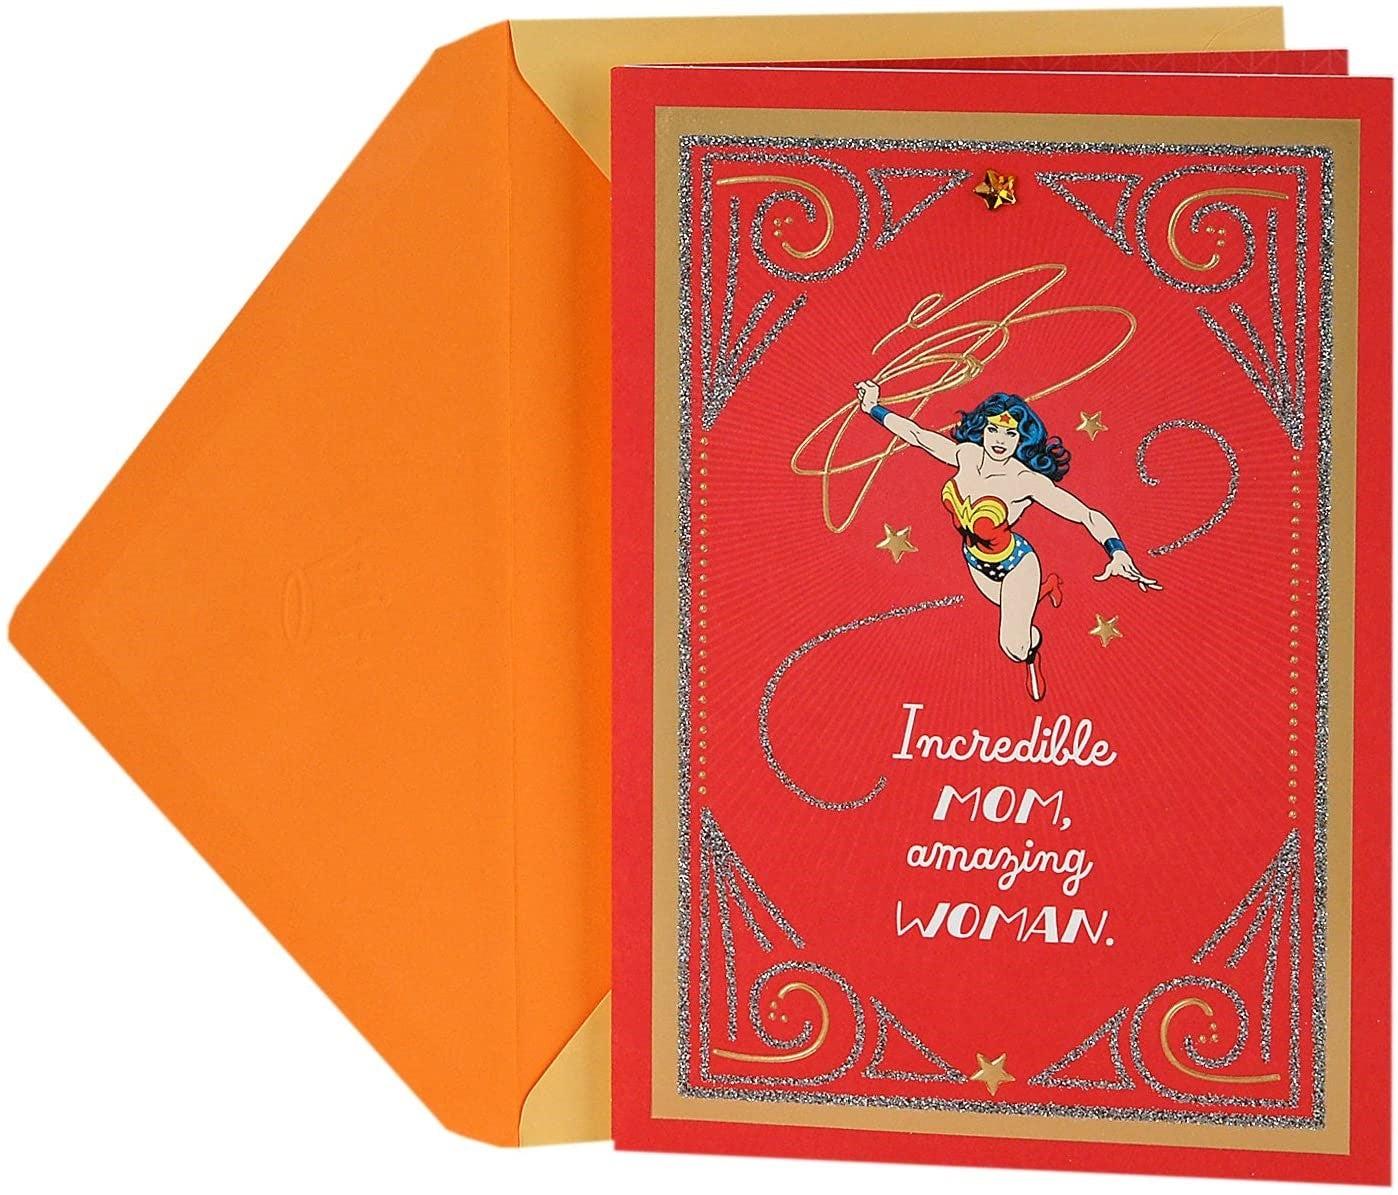 Hallmark-Wonder-Woman-Mother's-Day-Card.jpg